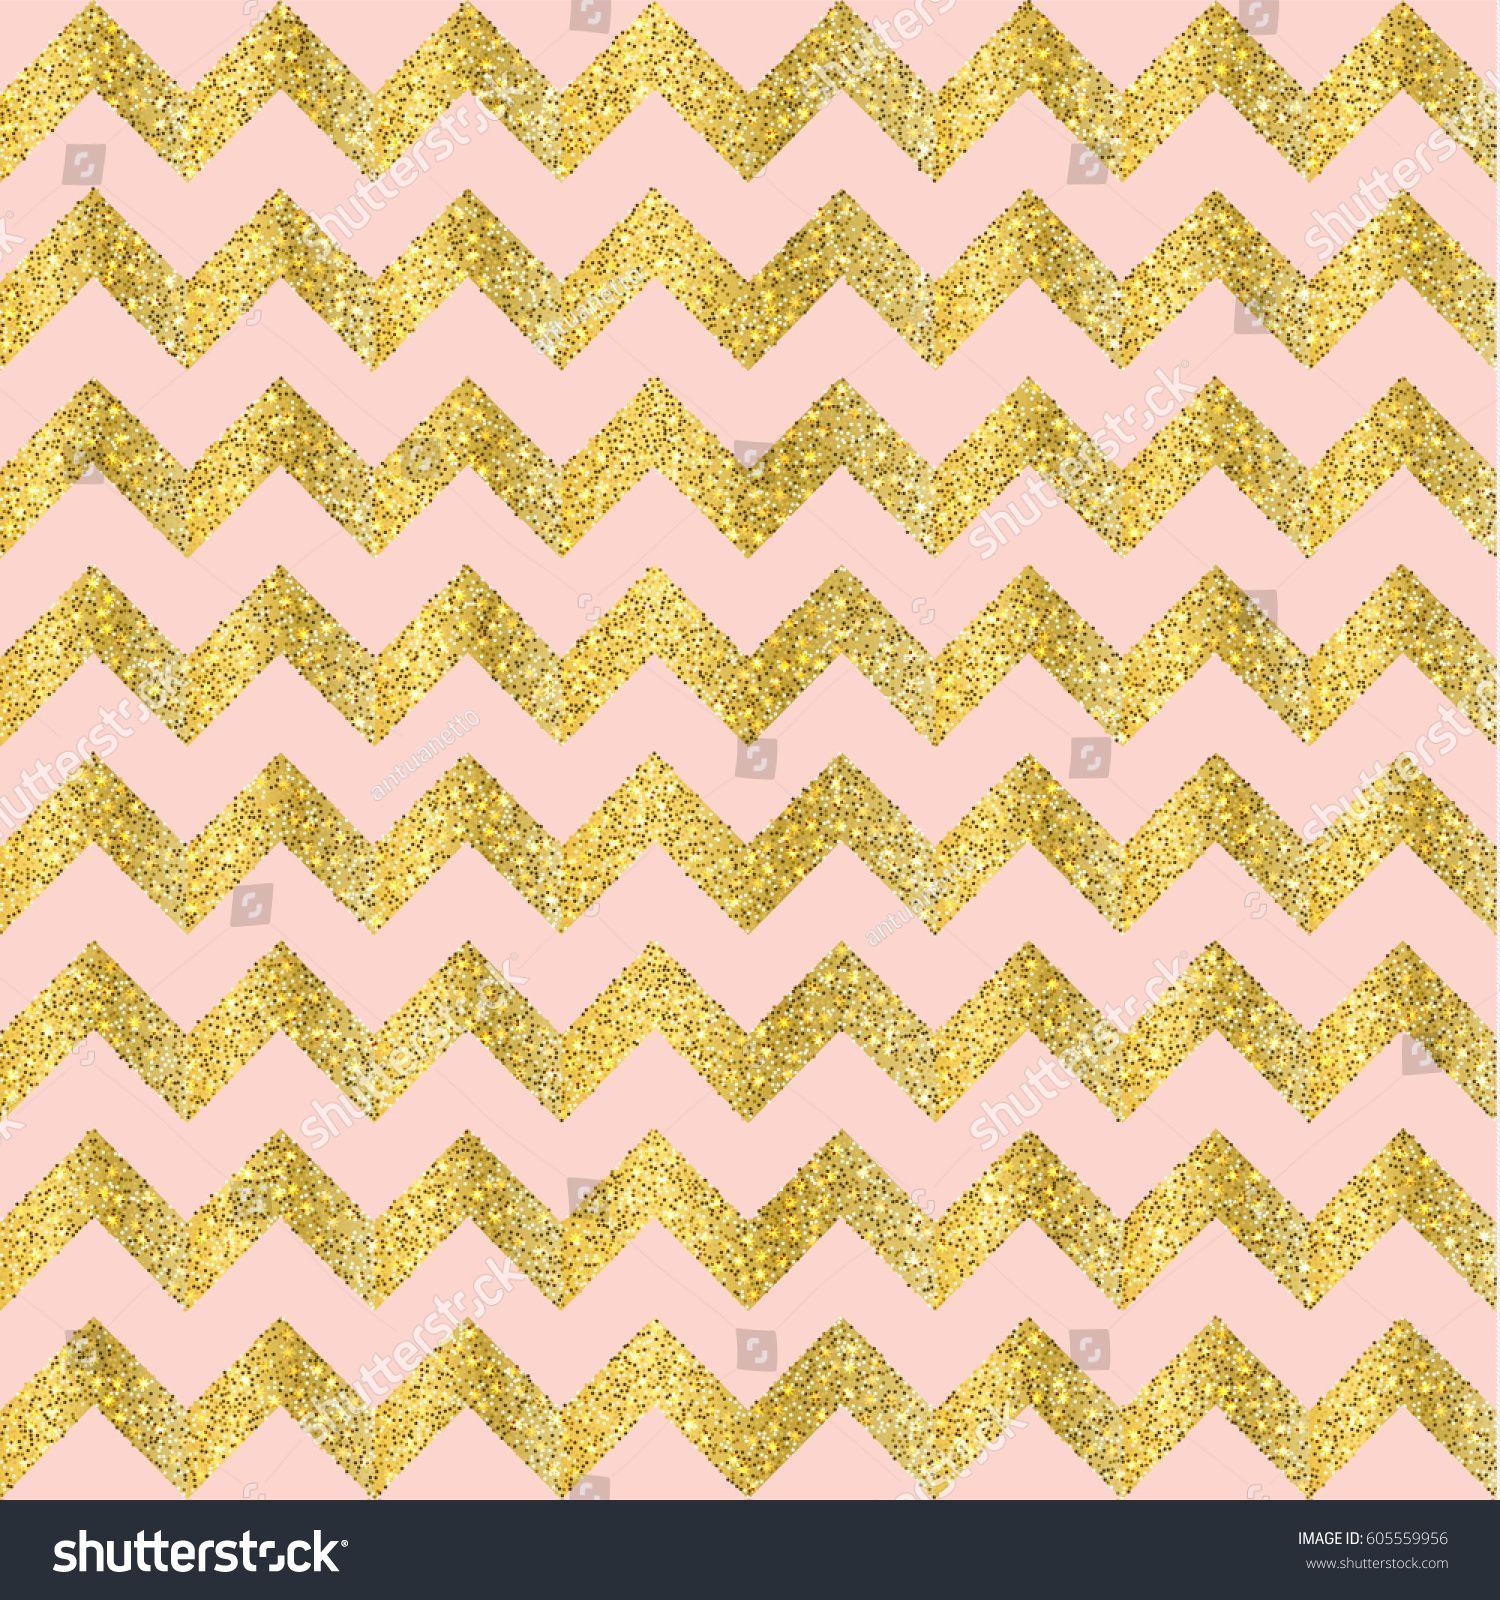 Vector Gold Glittering Confetti Seamless Pattern On Chevron Background And Pink Glitter